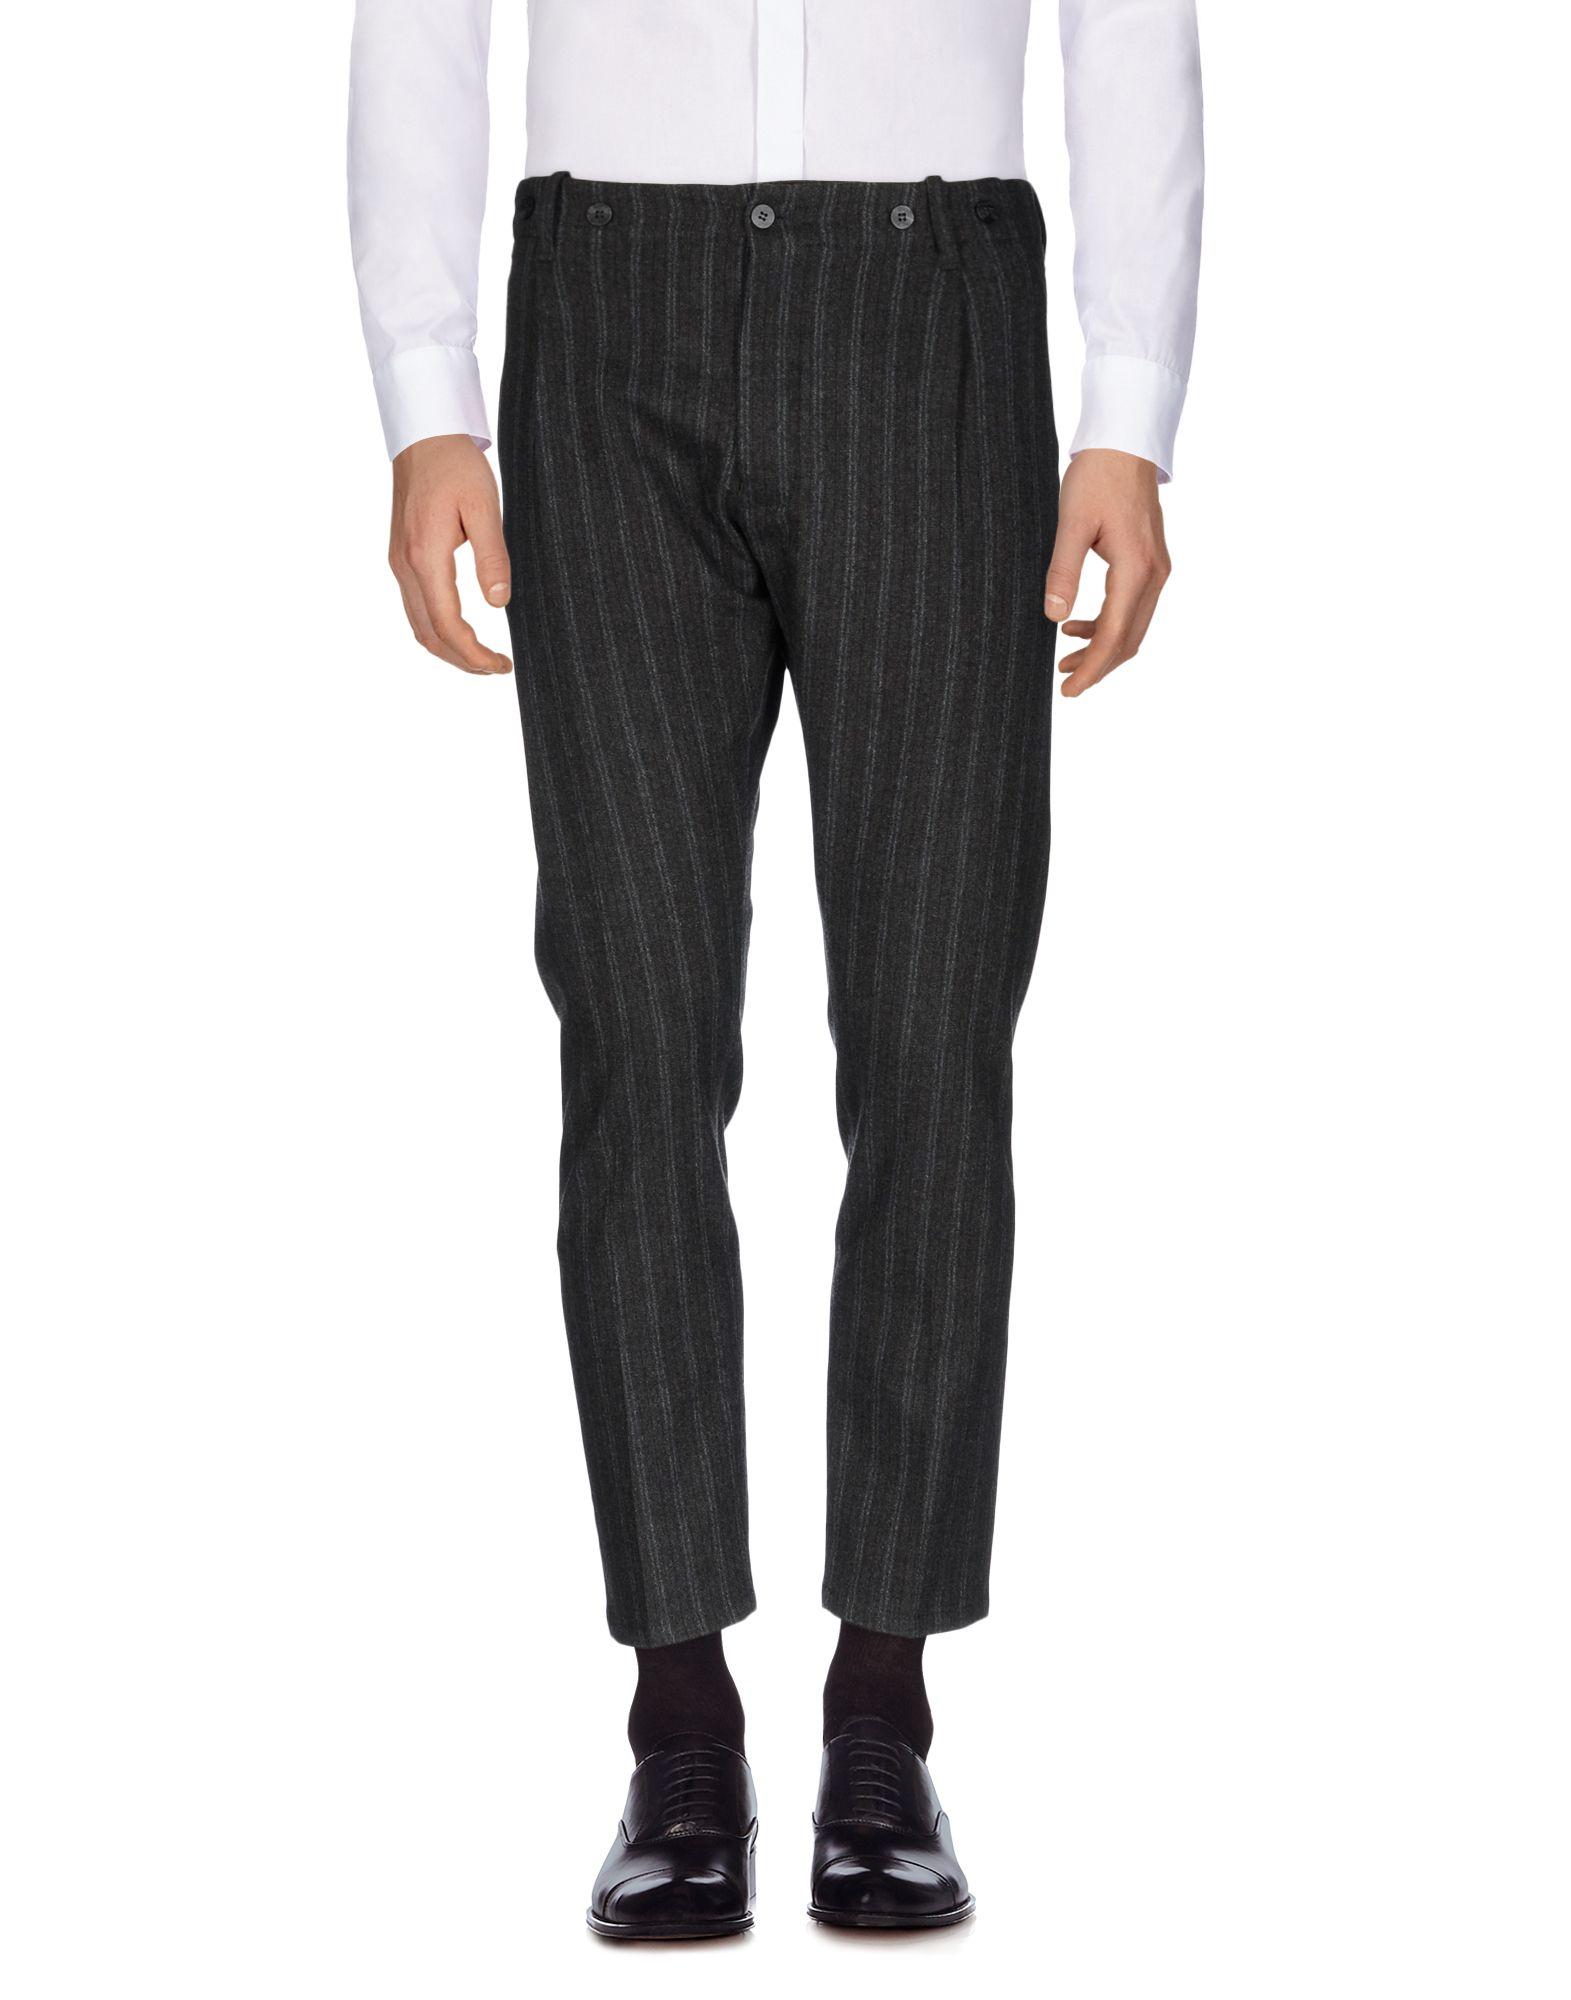 Pantalone Messagerie Uomo - Acquista online su